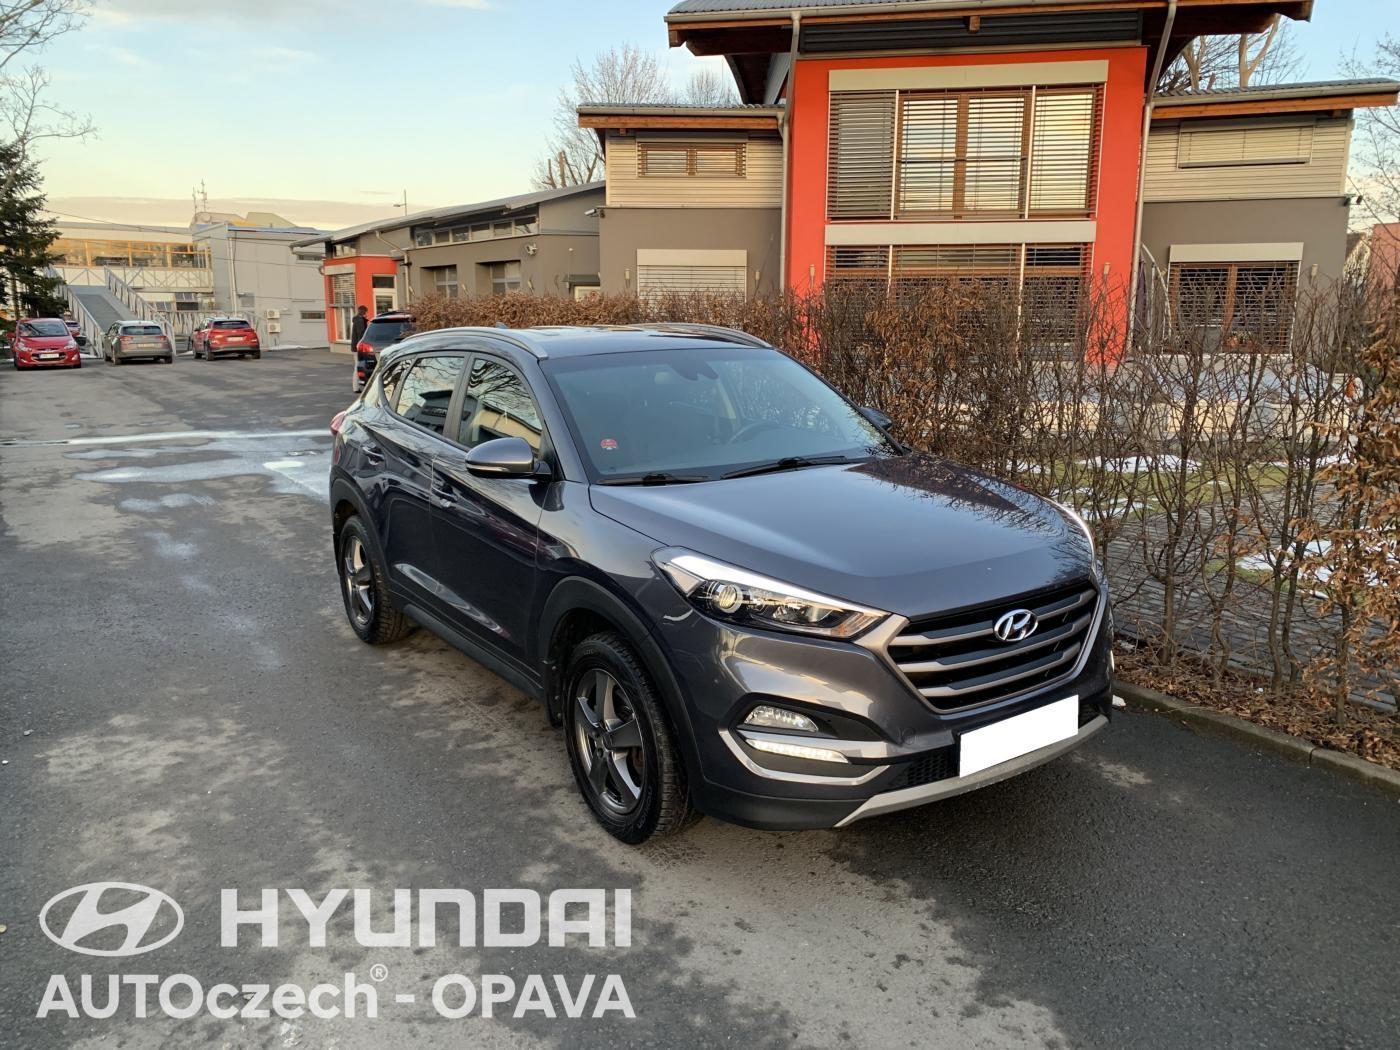 Hyundai Tucson 1.7 CRDi 85 kW Trikolor, DPH SUV